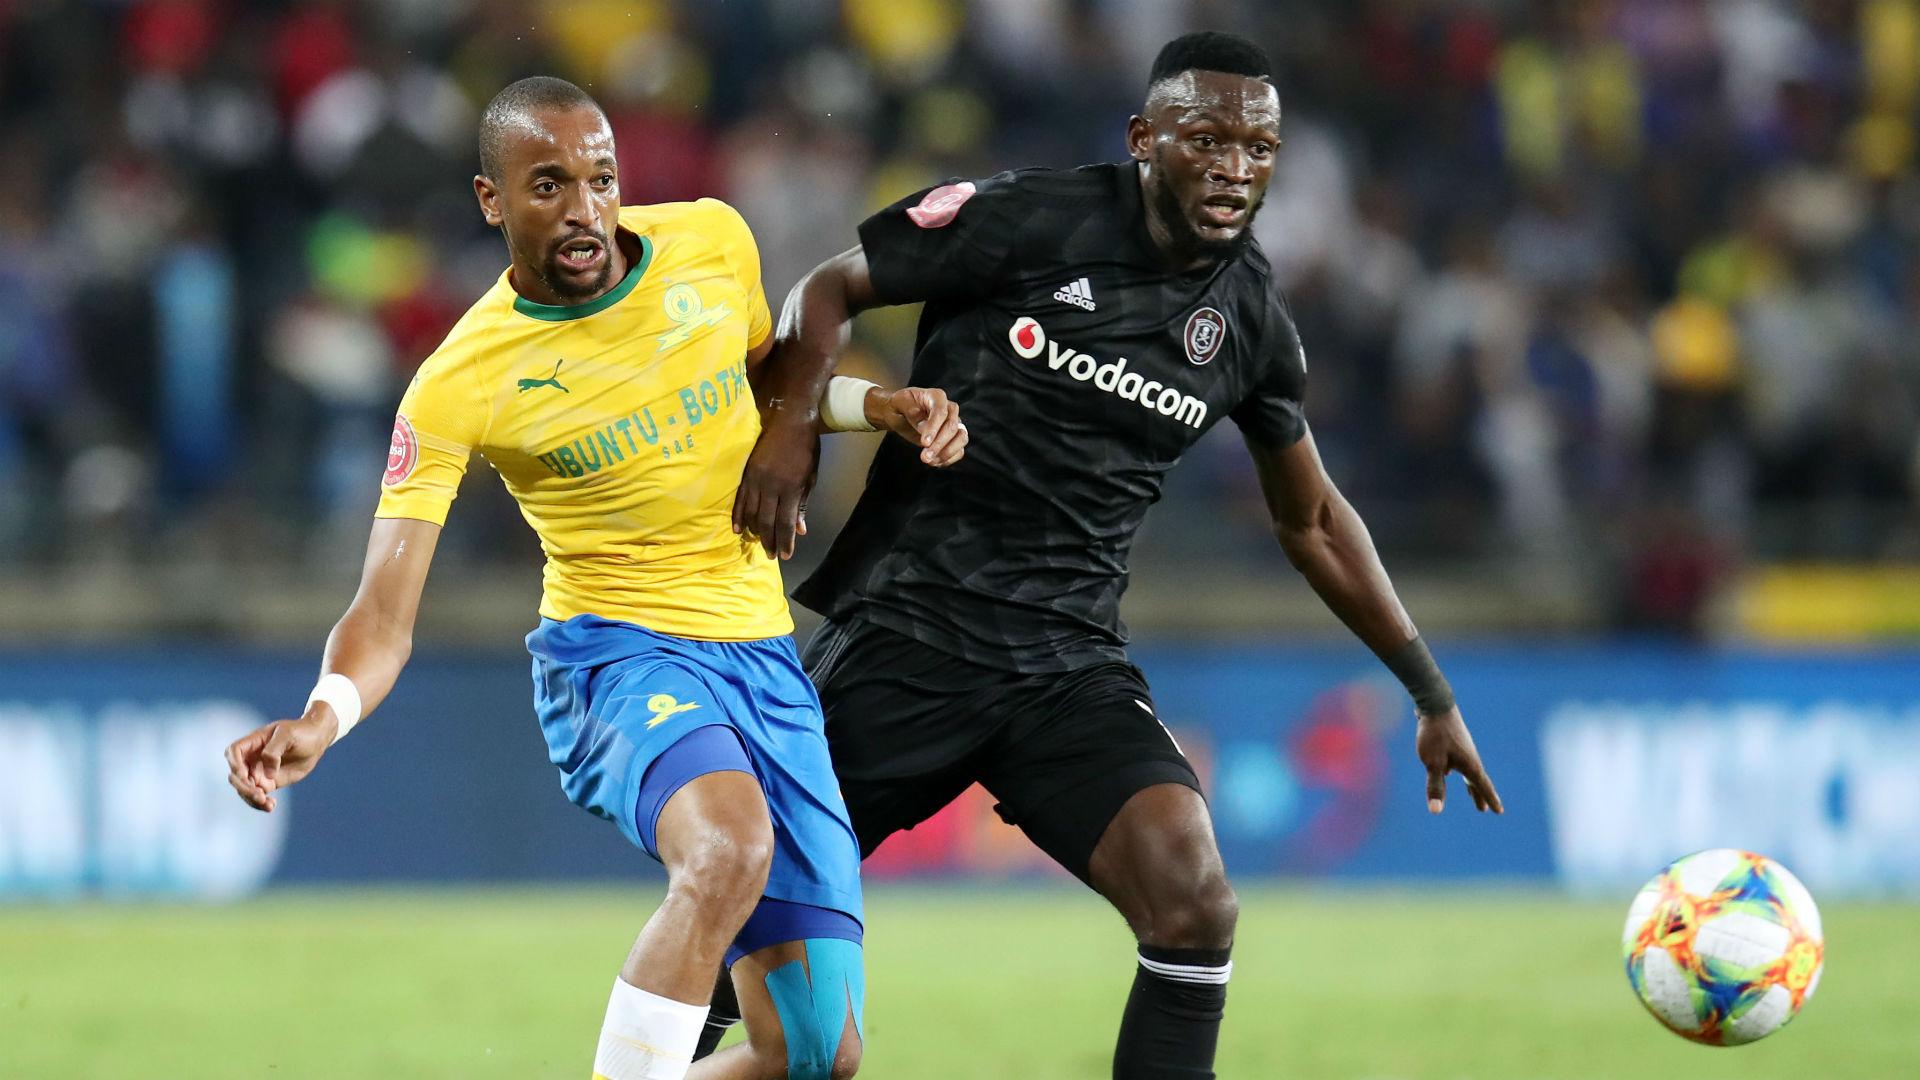 Sundowns and Pirates play goalless in SA Premiership restart - Sports Leo